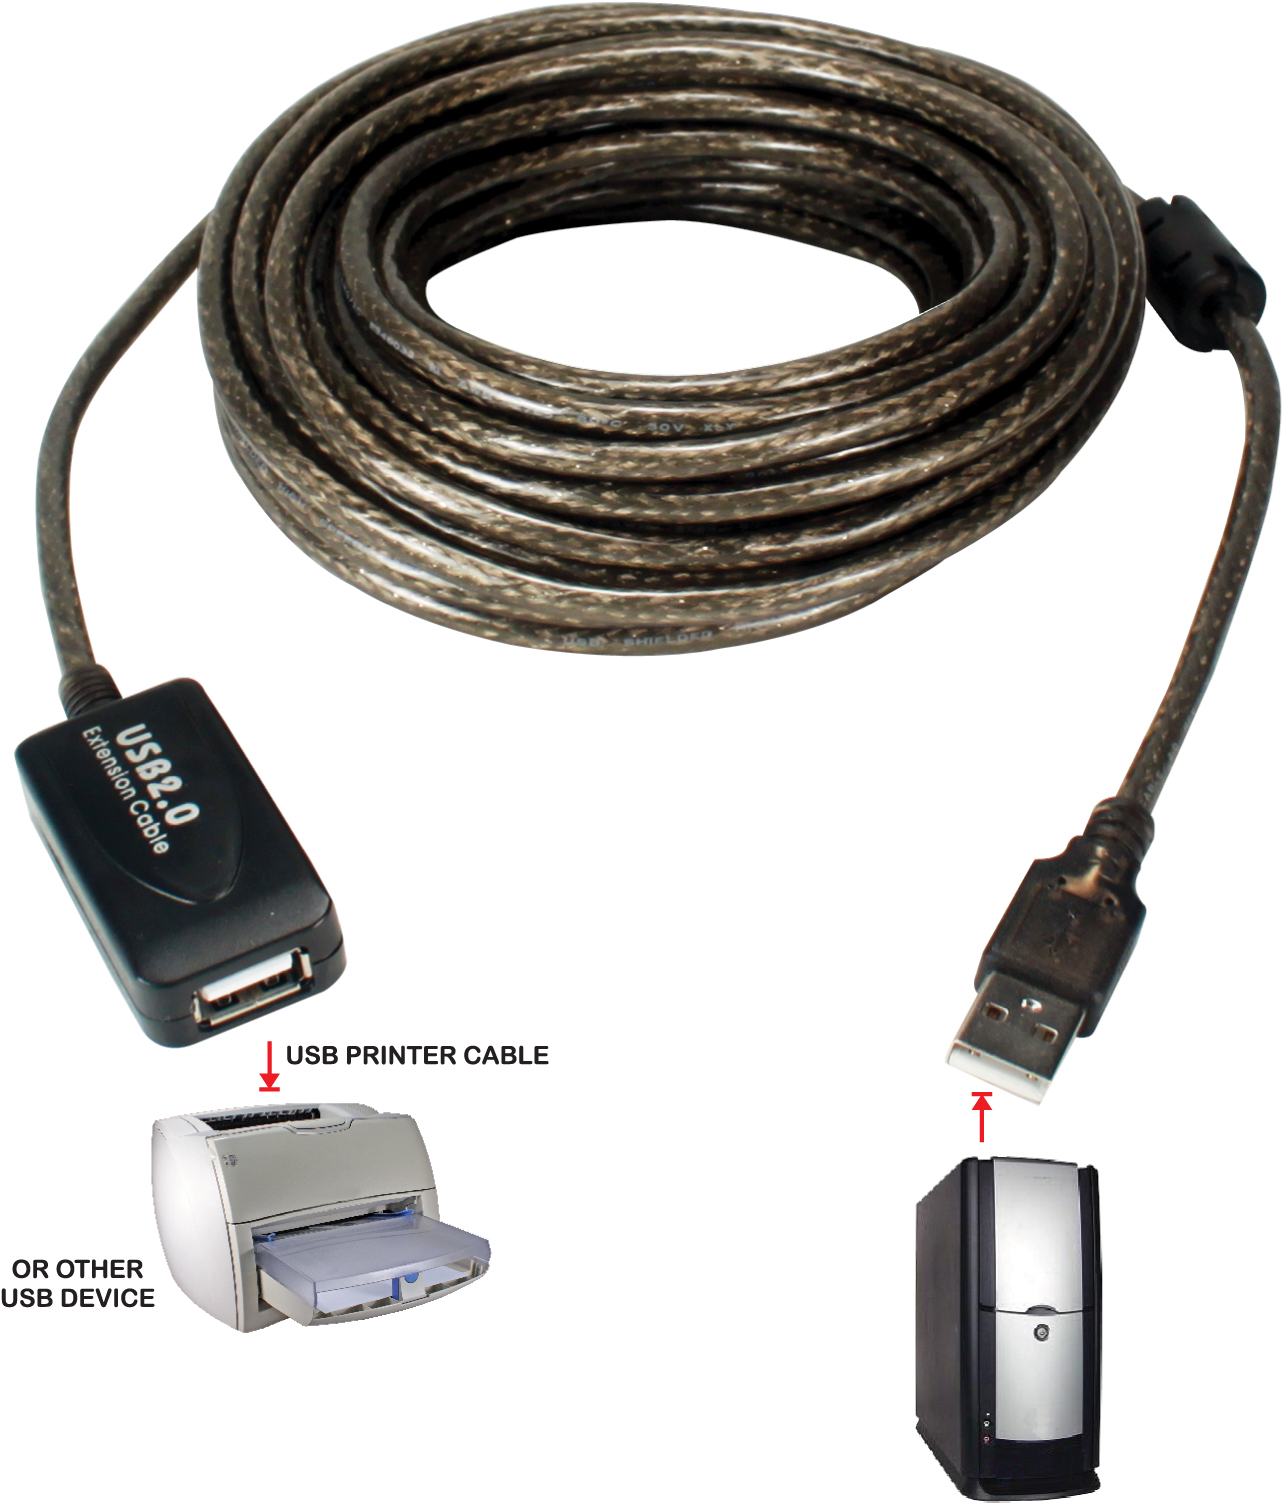 QVS - USB 2.0 and 1.1 PCI Cards